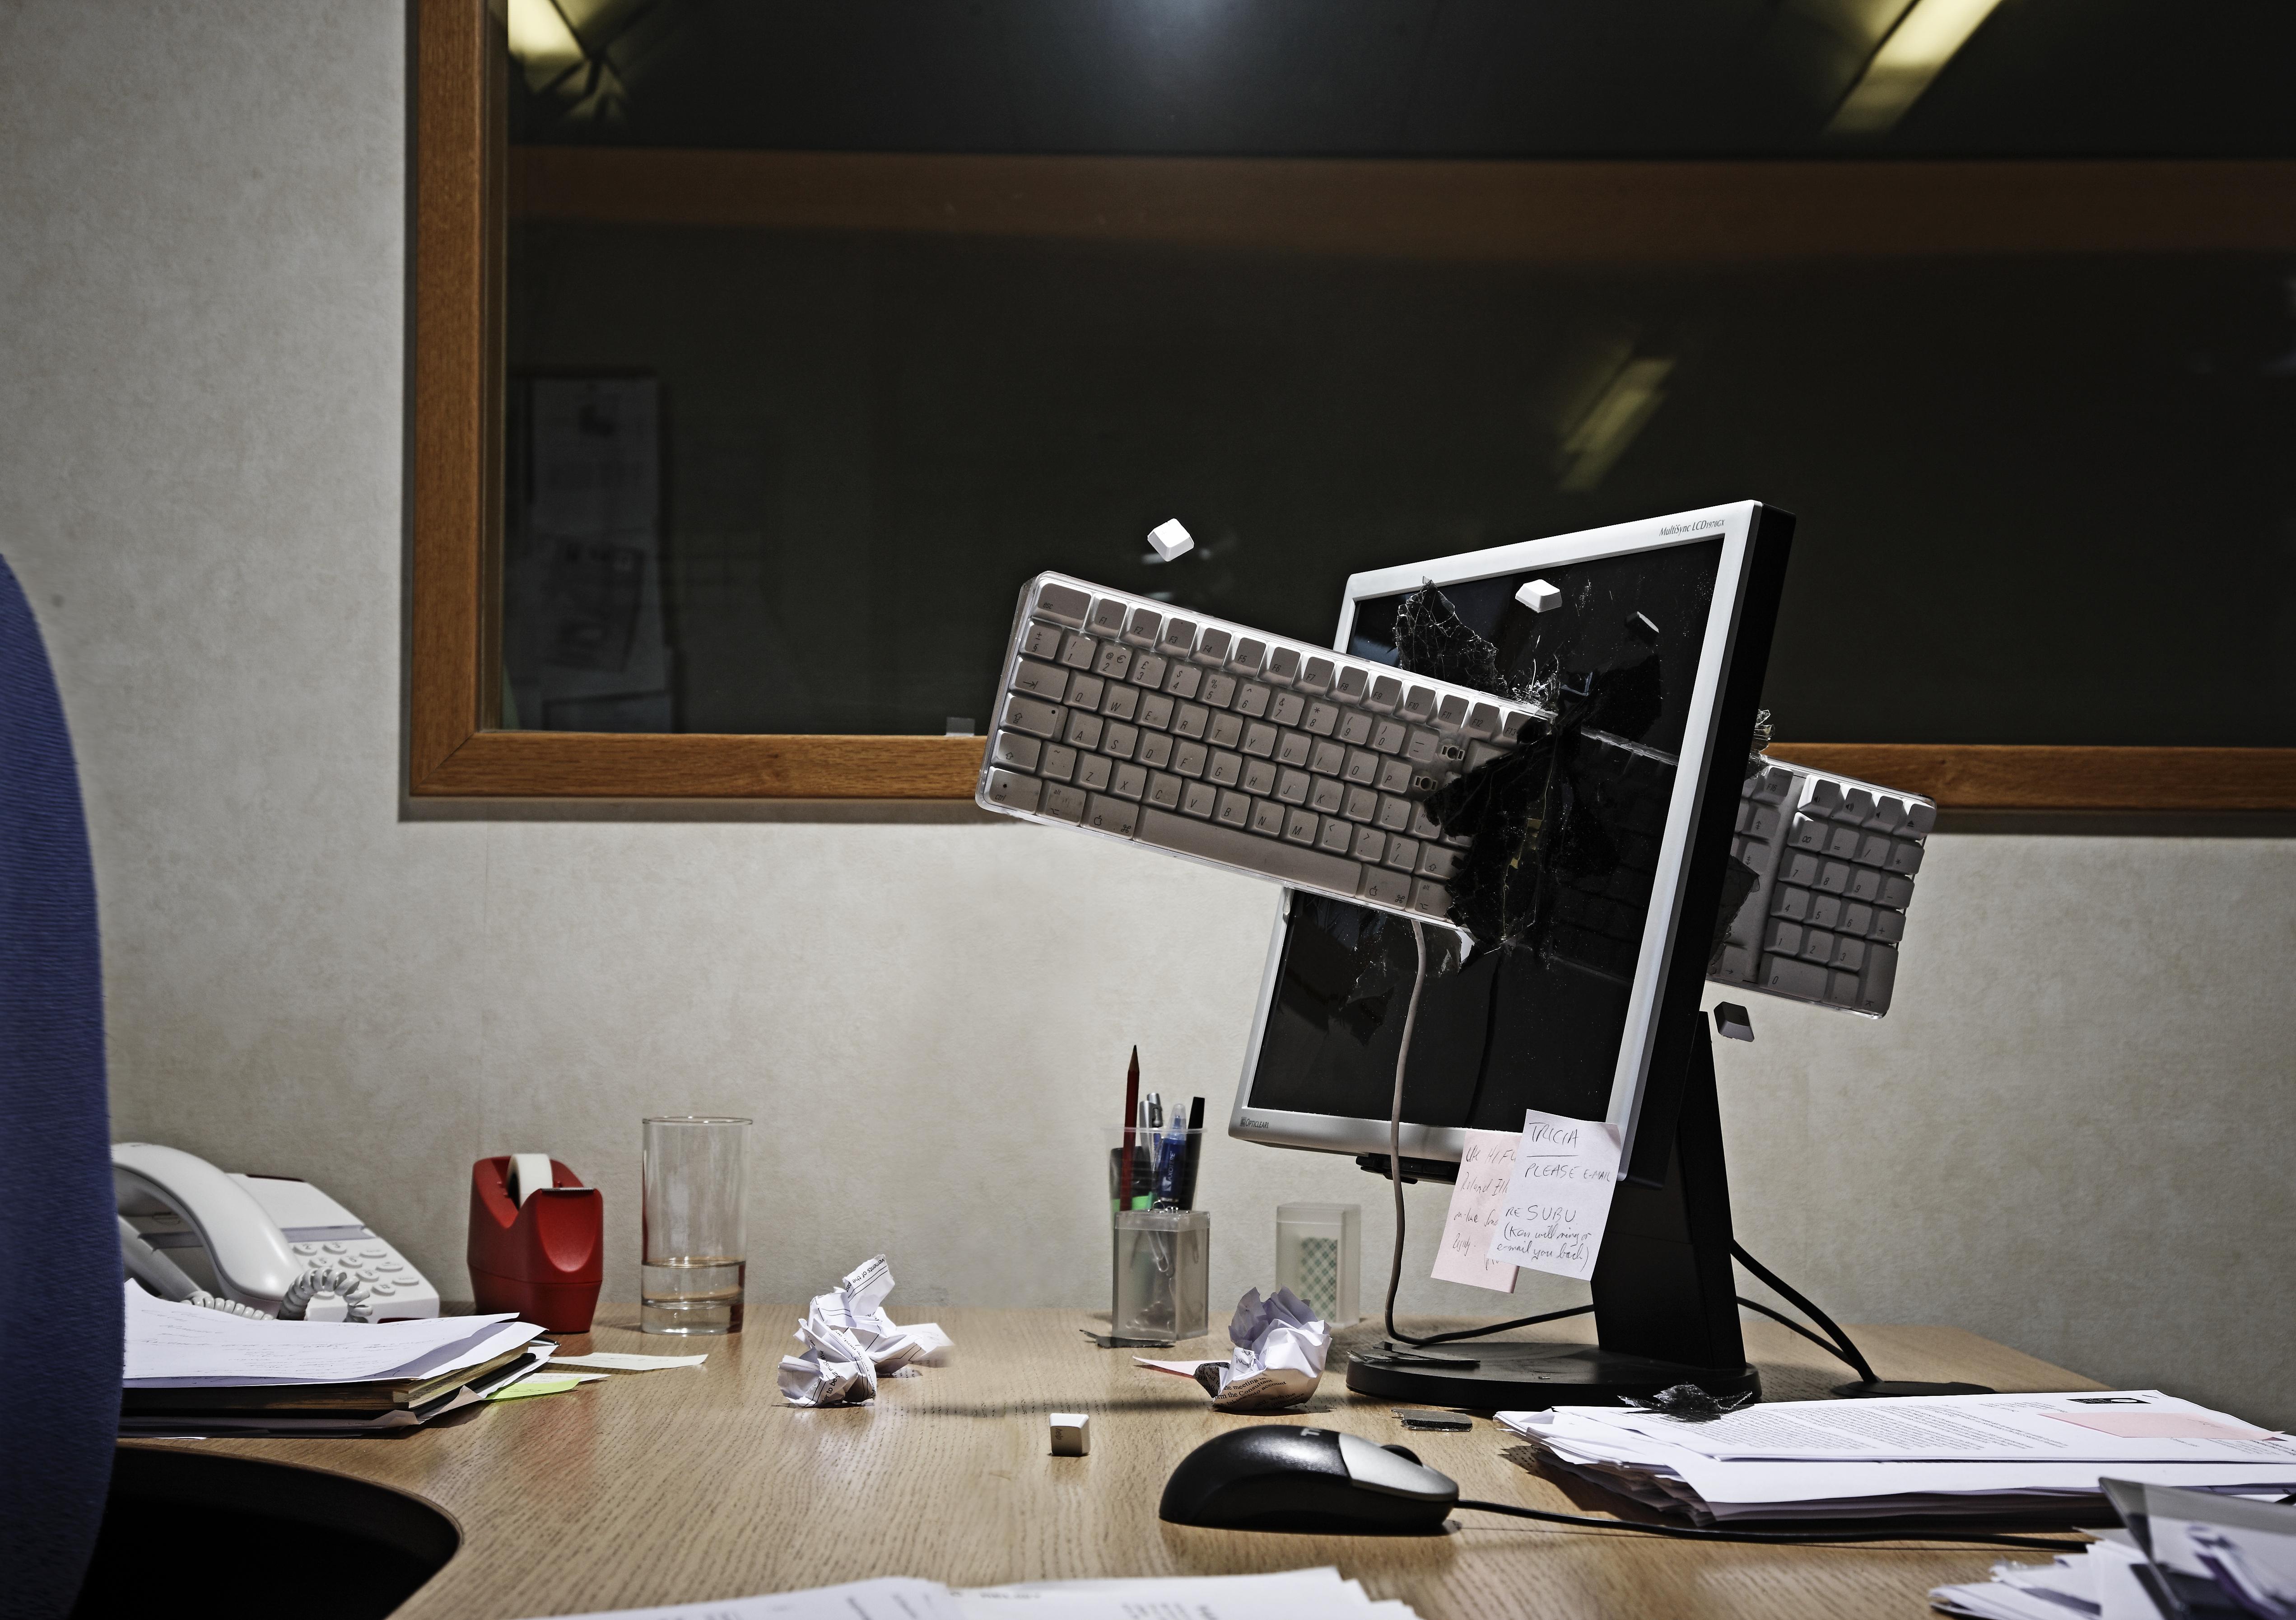 computer keyboard smashed through screen